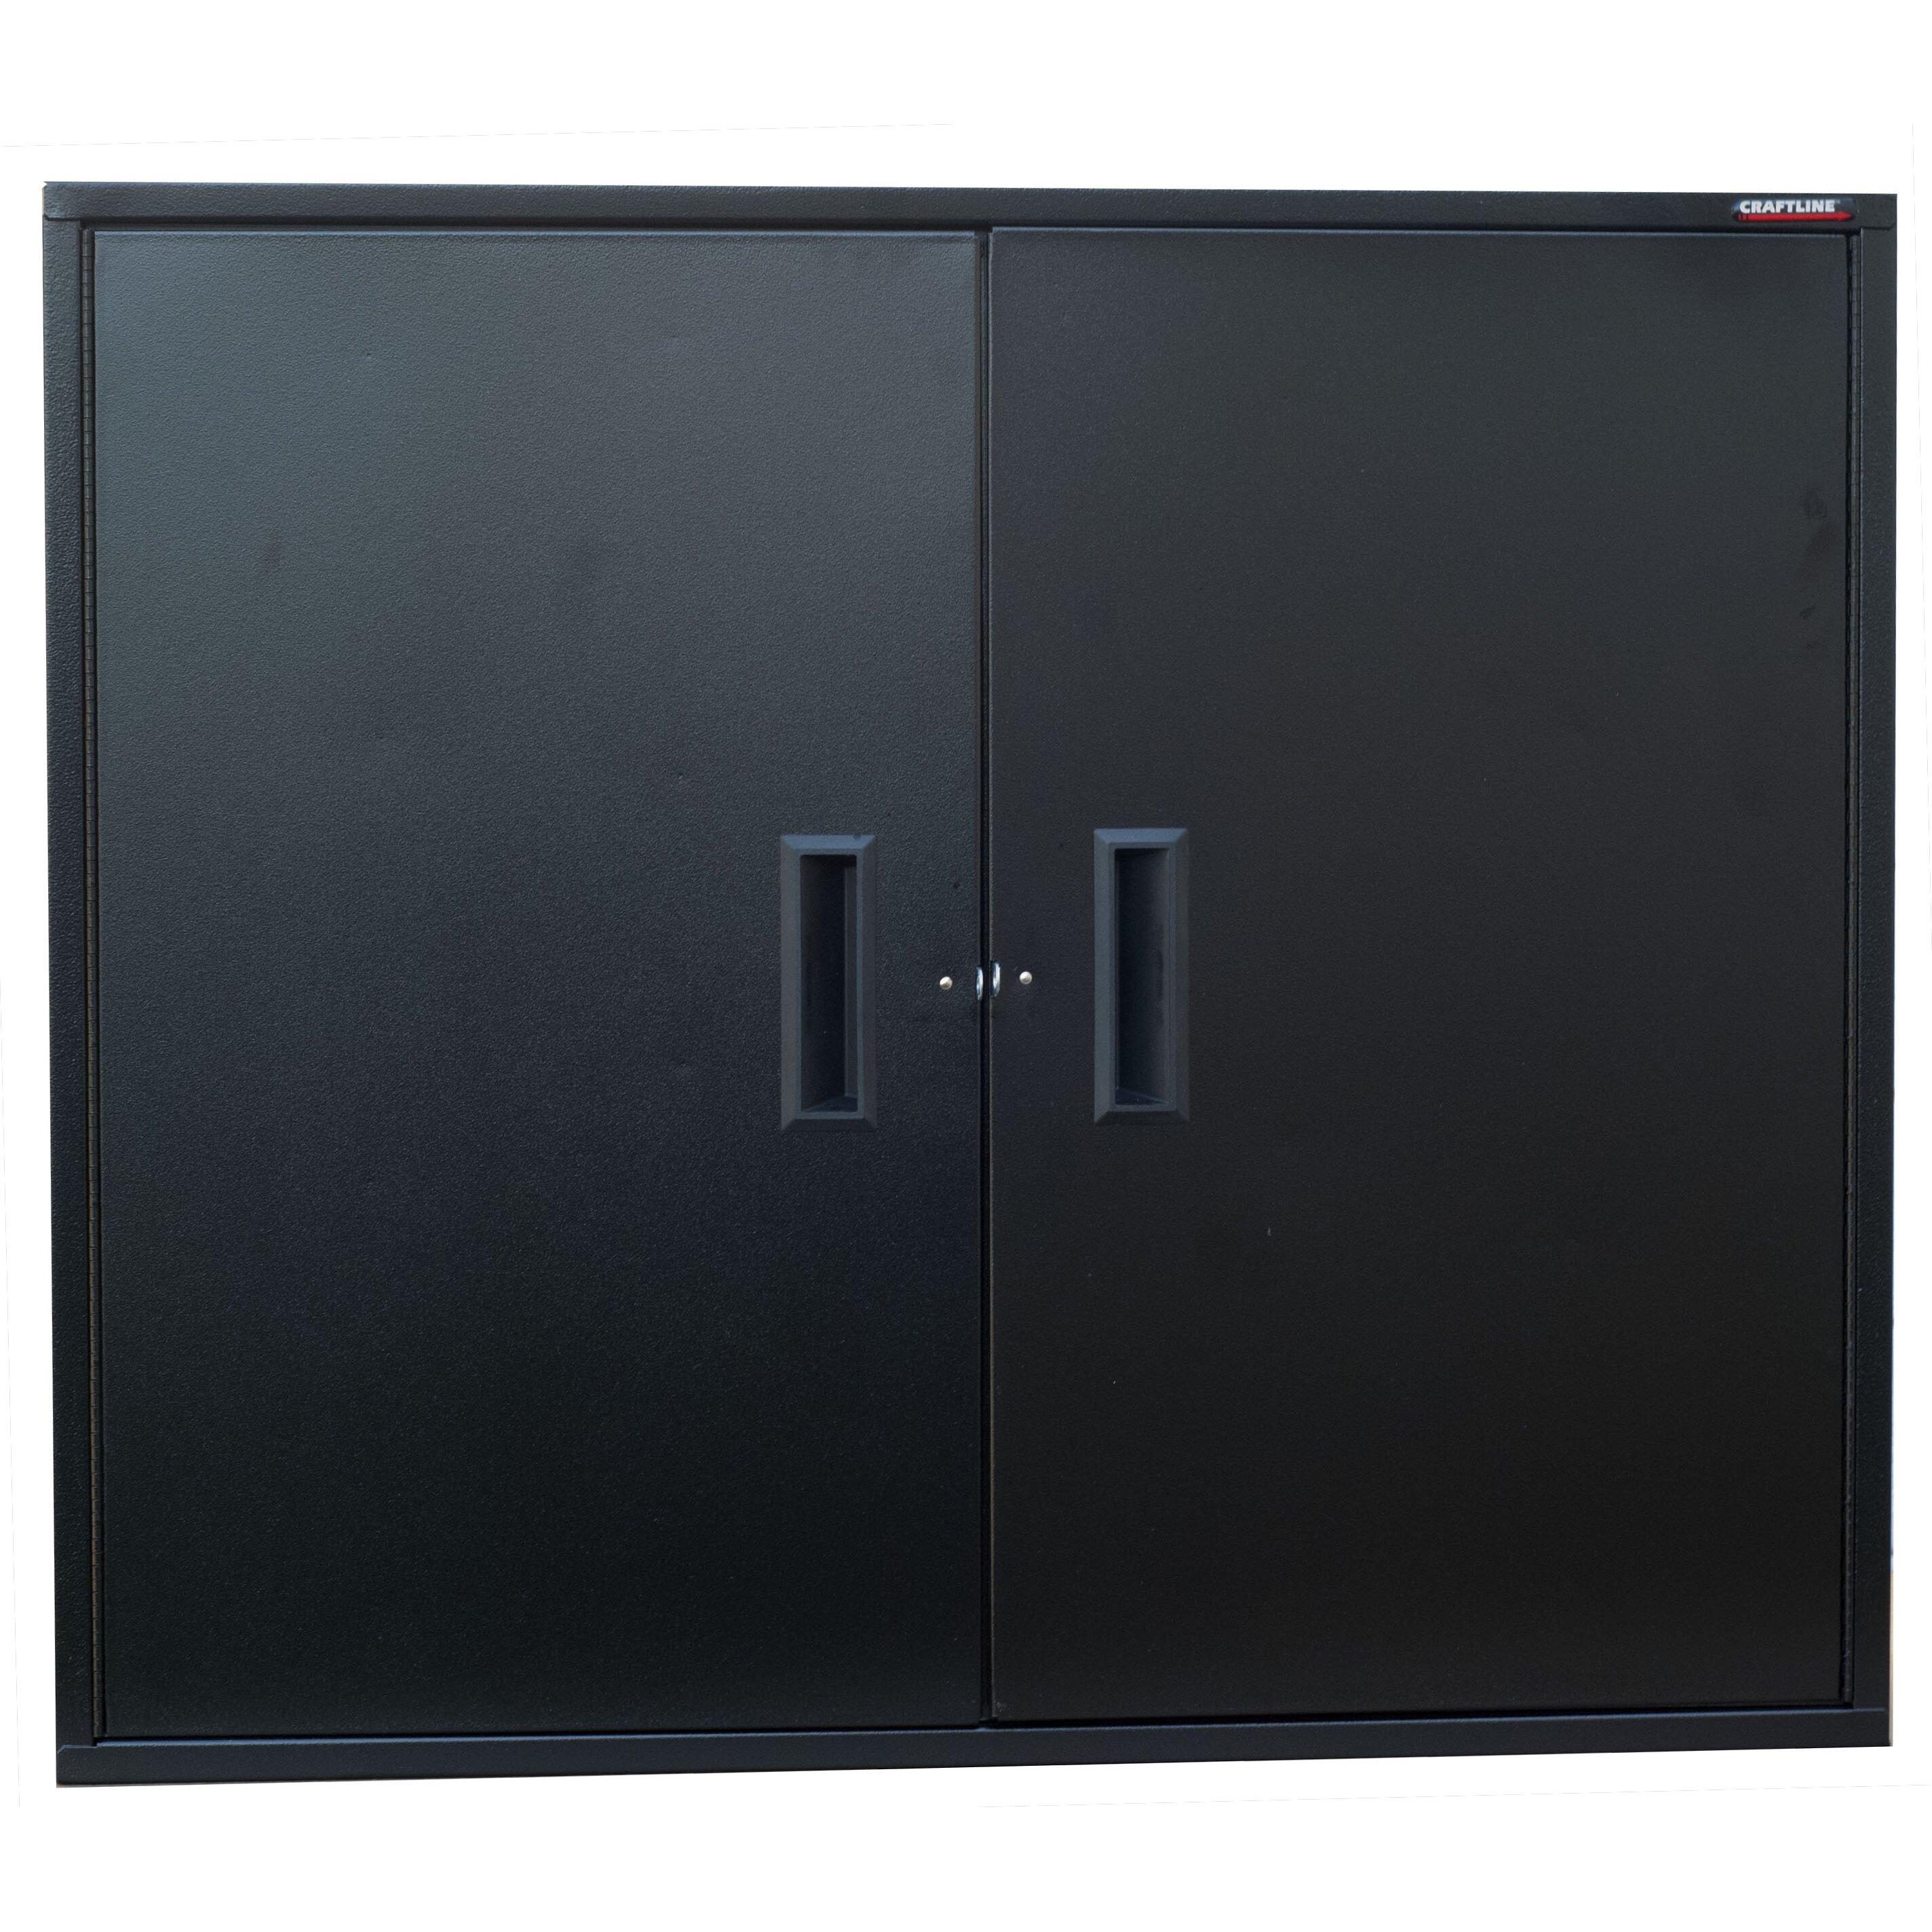 Resin Utility Cabinet Craftline 30 H X 3525 W X 125 D 2 Door Utility Cabinet